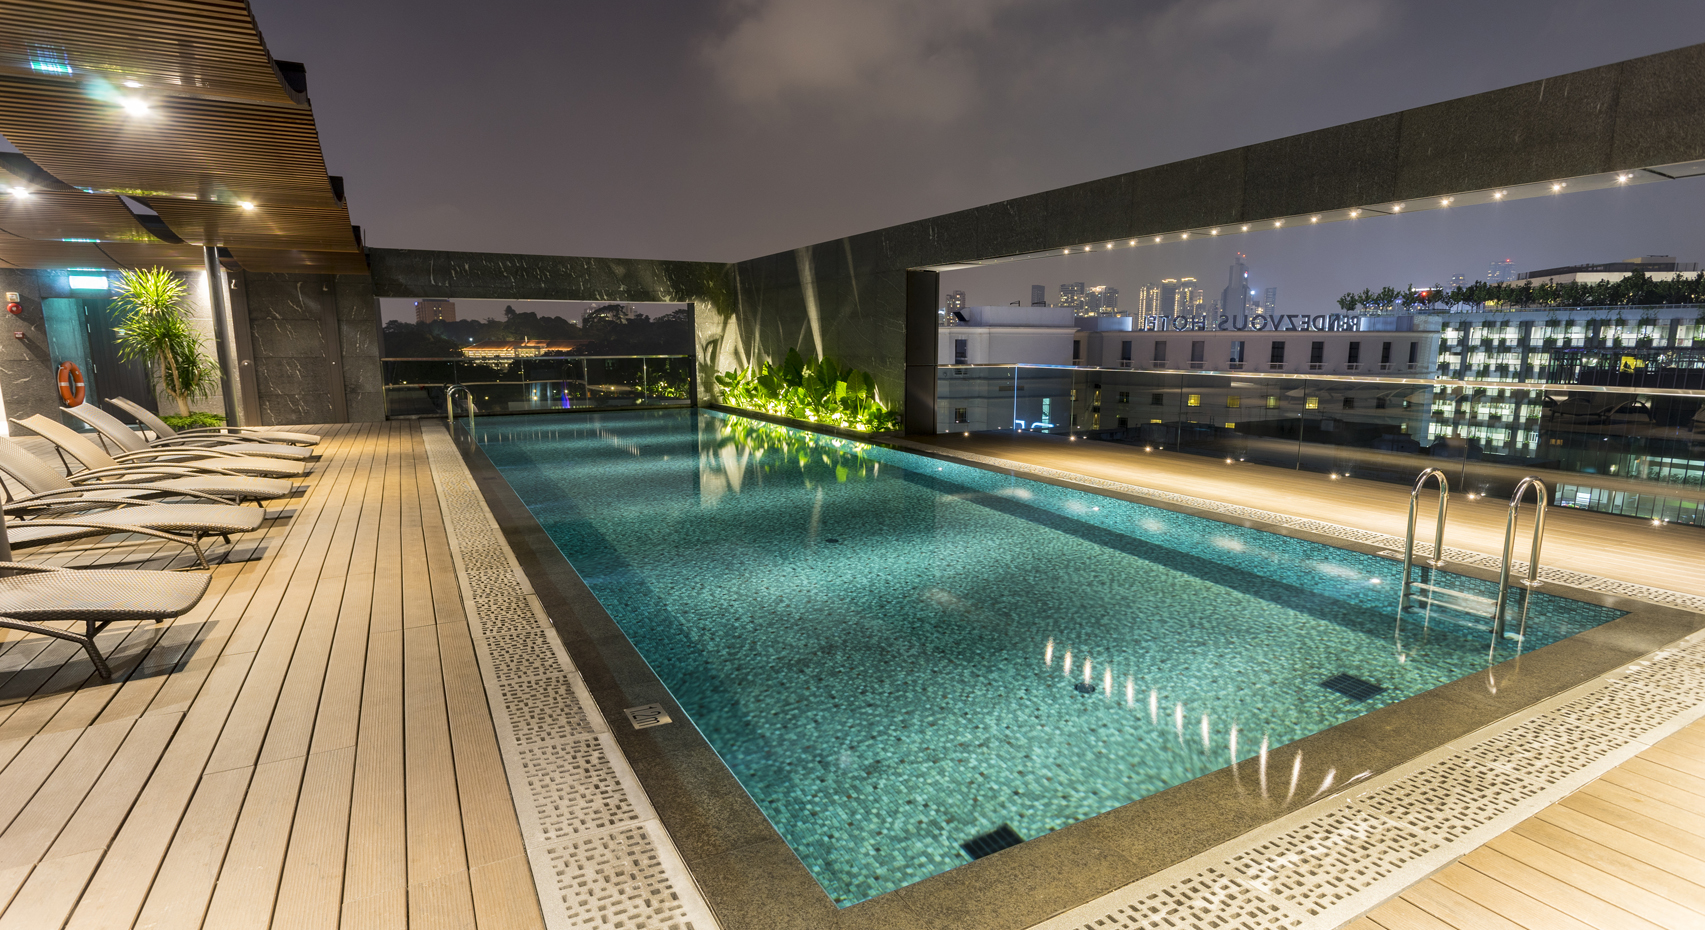 Wellness swimming pool singapore hotel 30 bencoolen - Swimming pool singapore opening hours ...